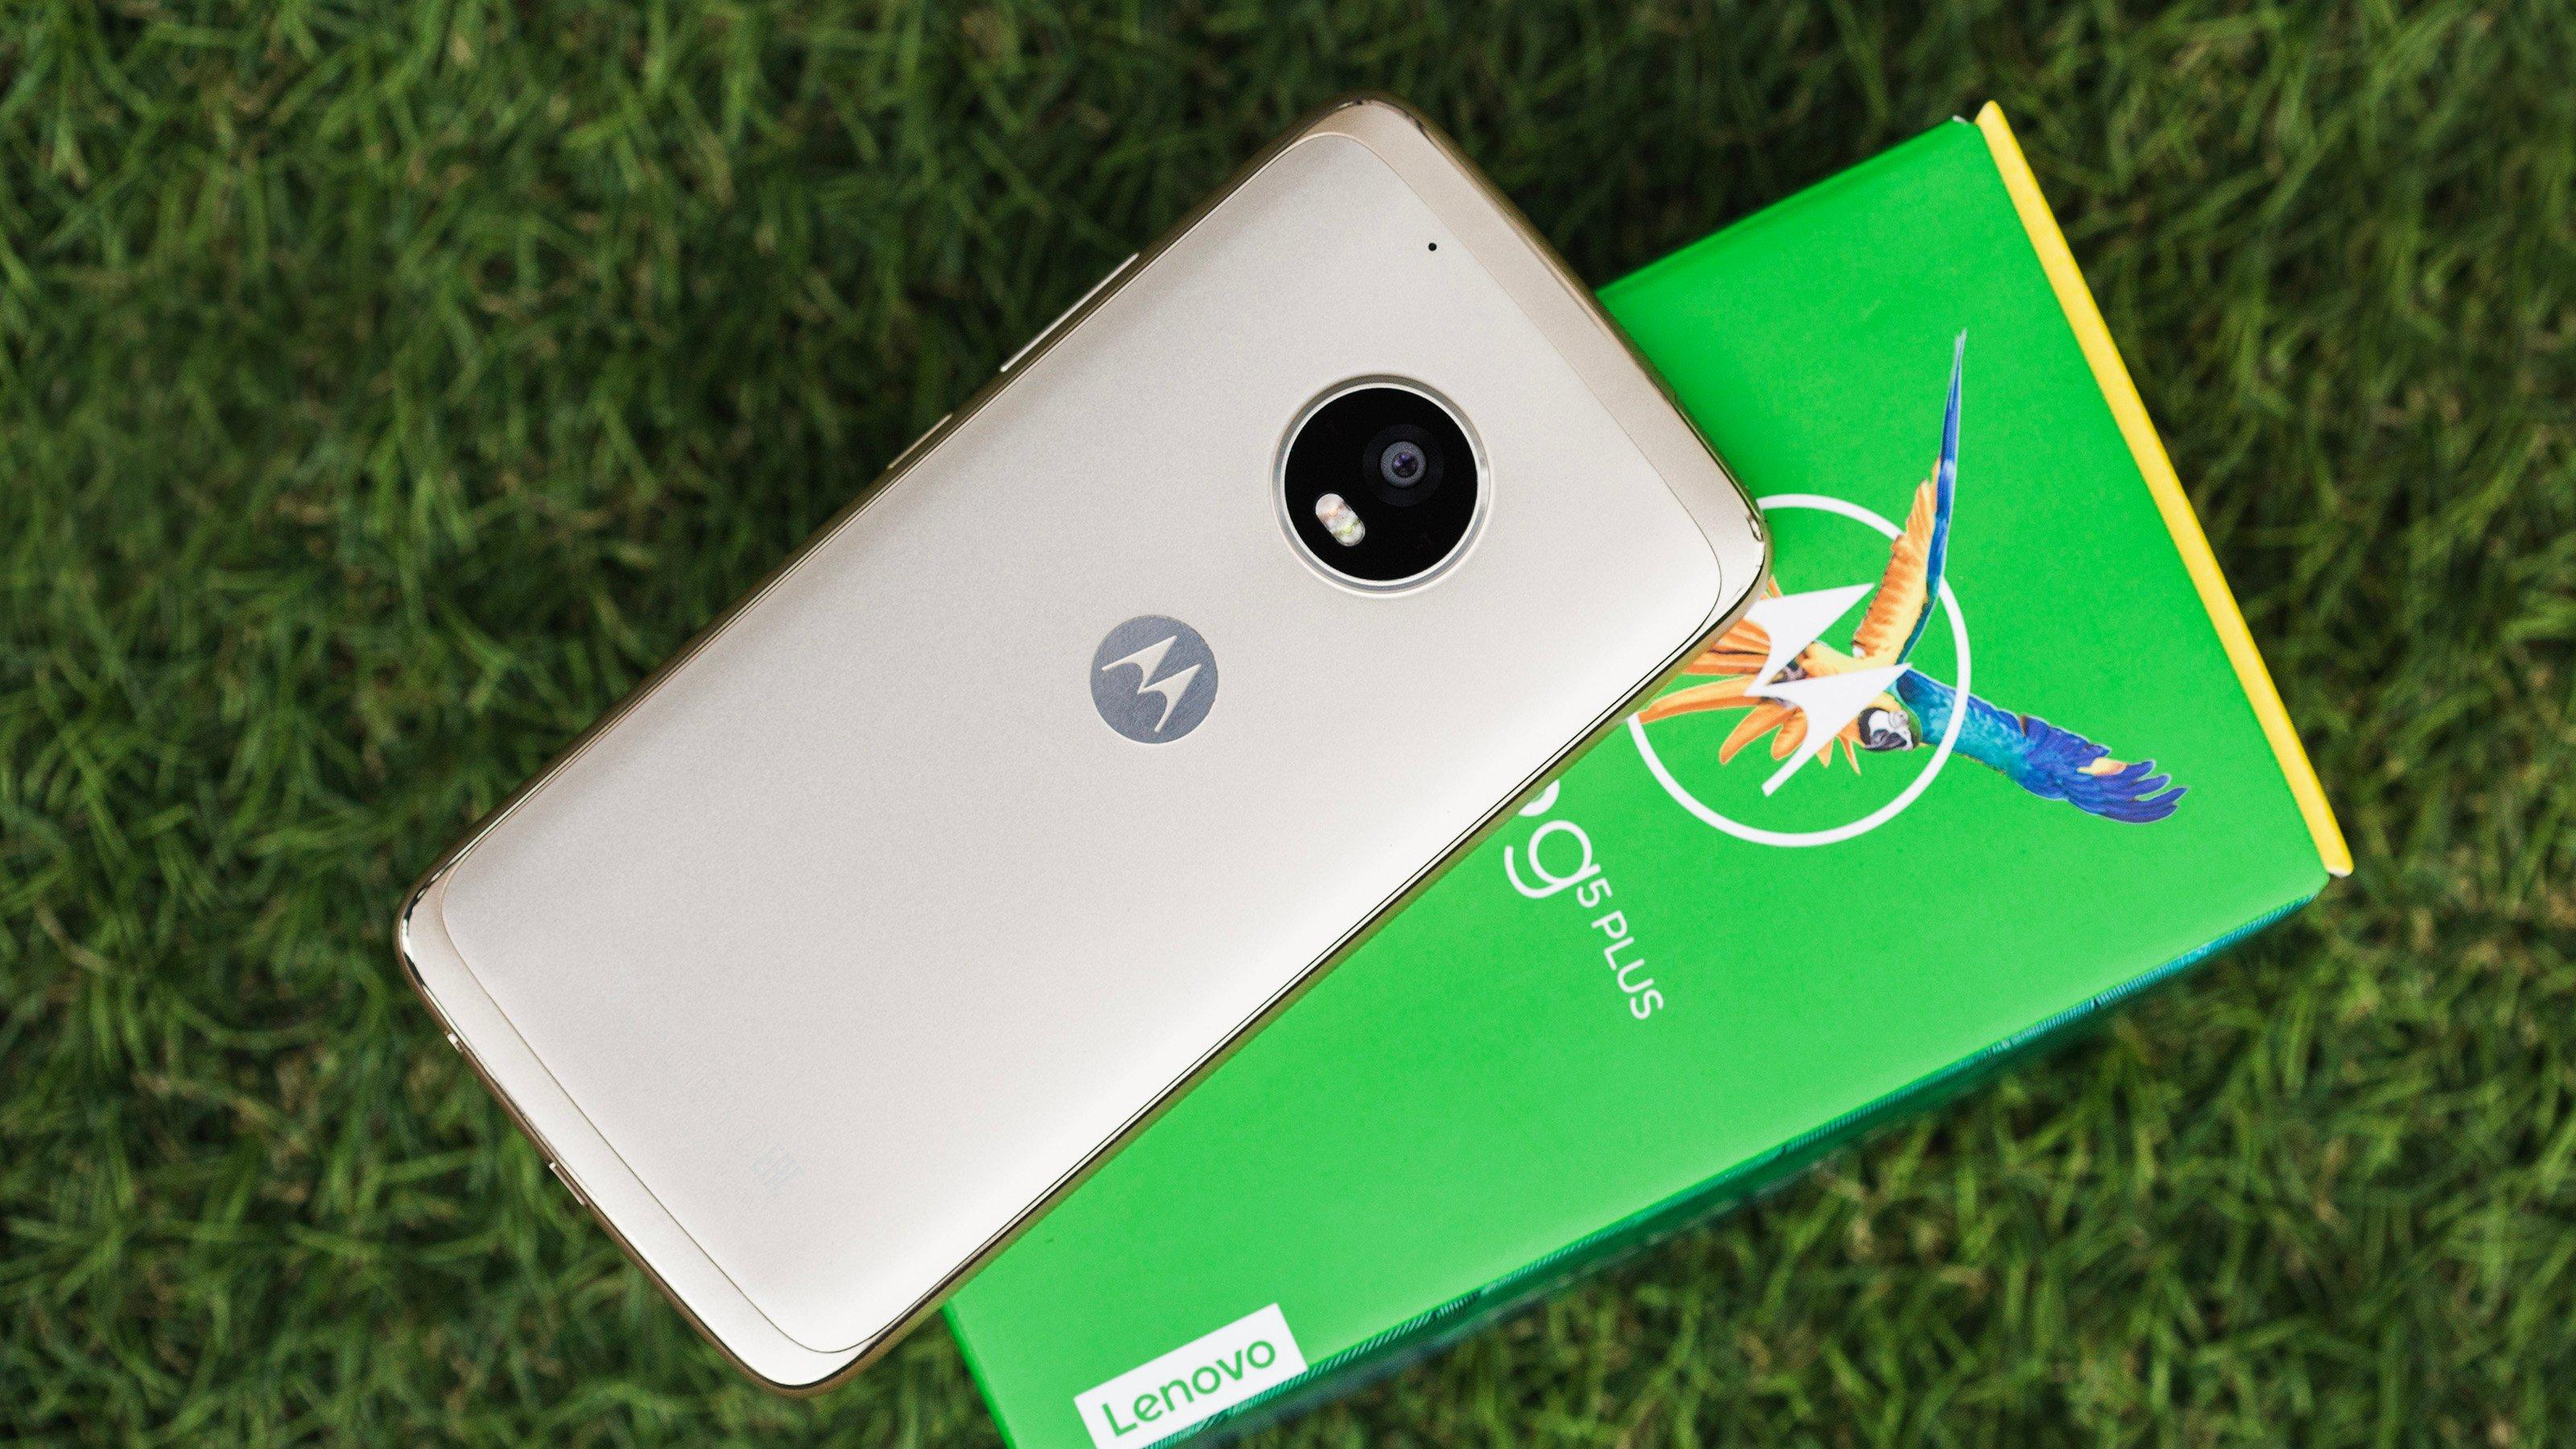 Moto G5 Plus caja oficial